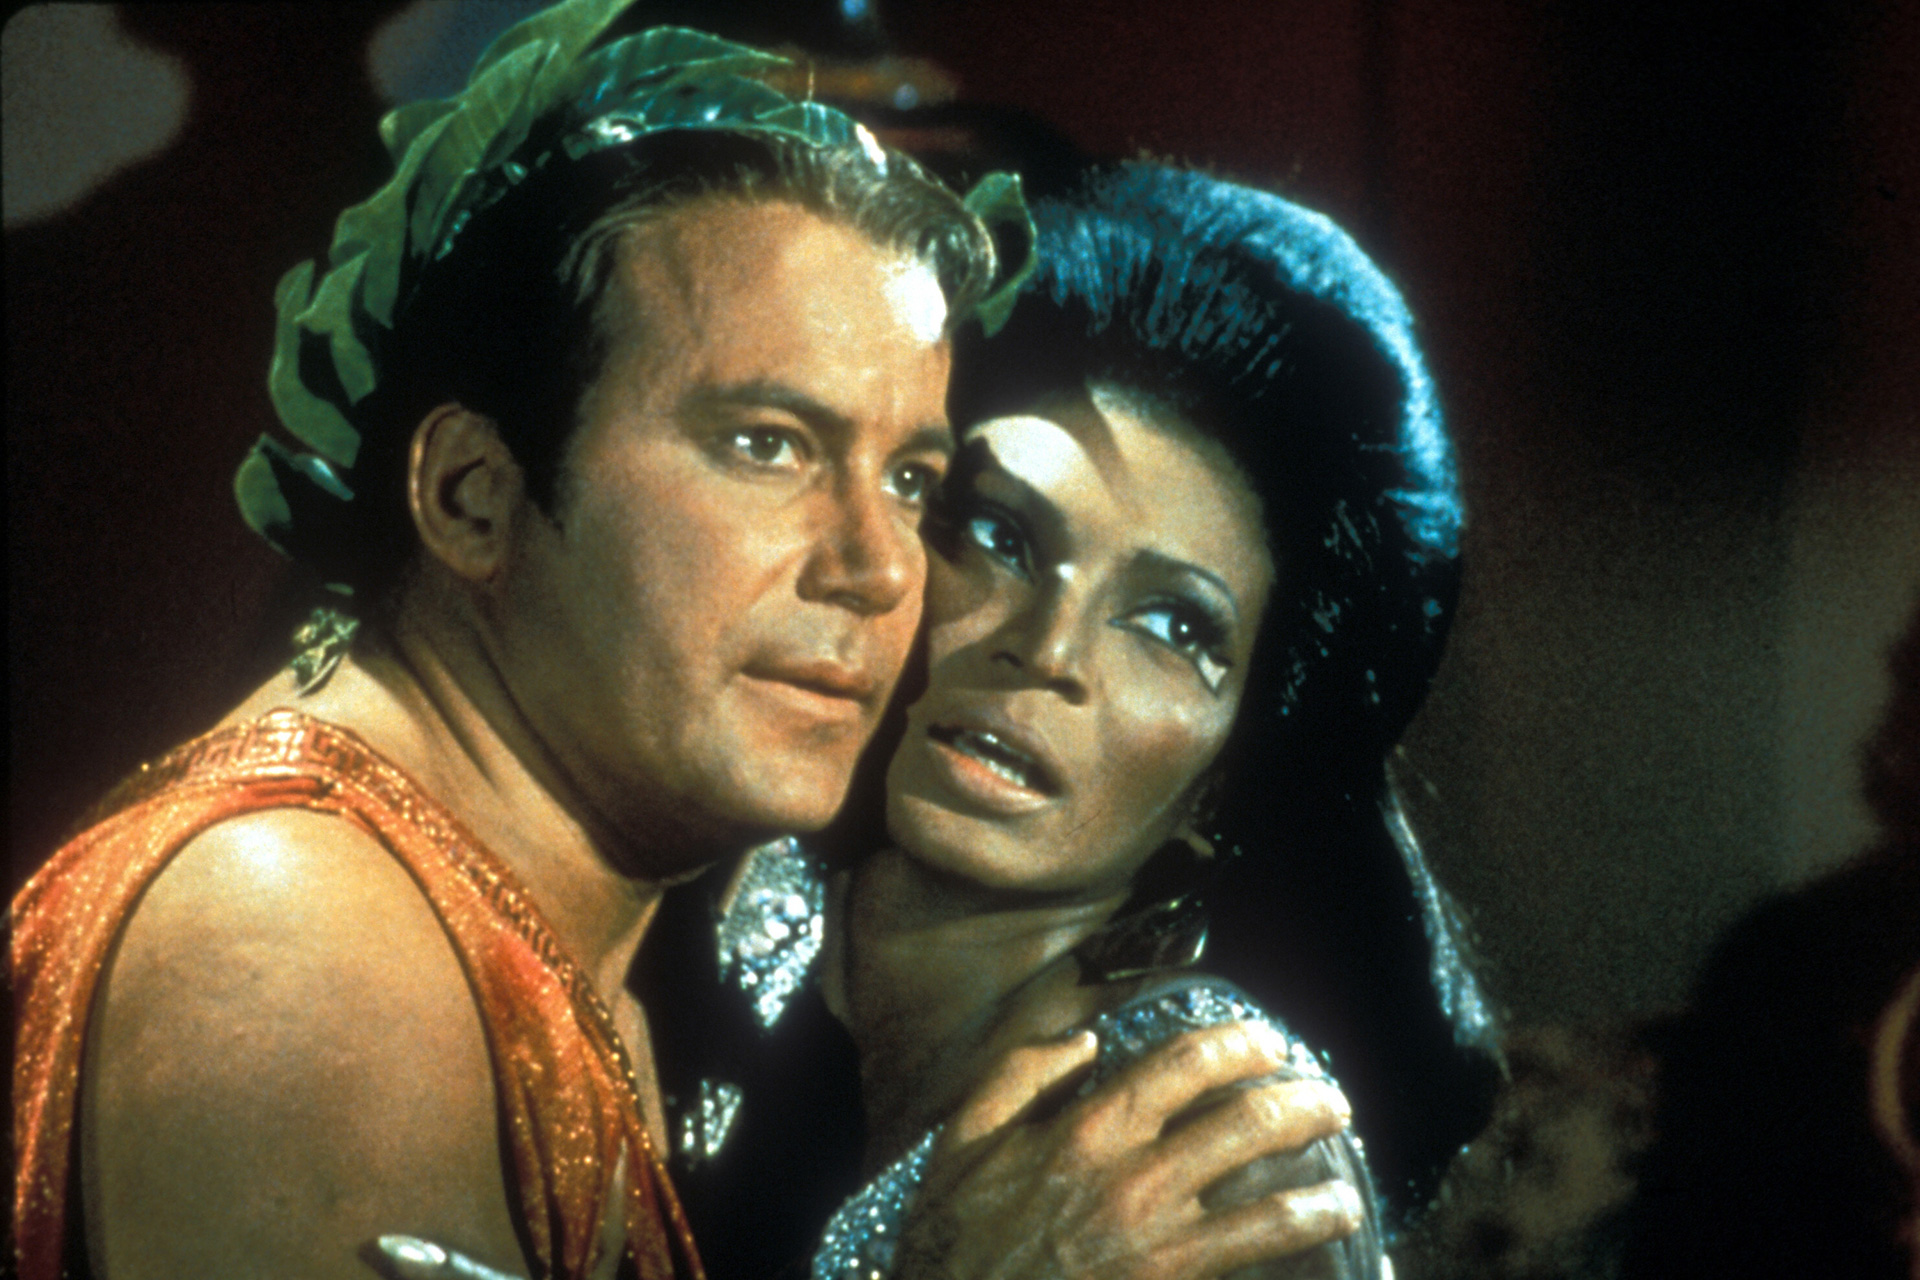 Capt. James T. Kirk and Lt. Uhura